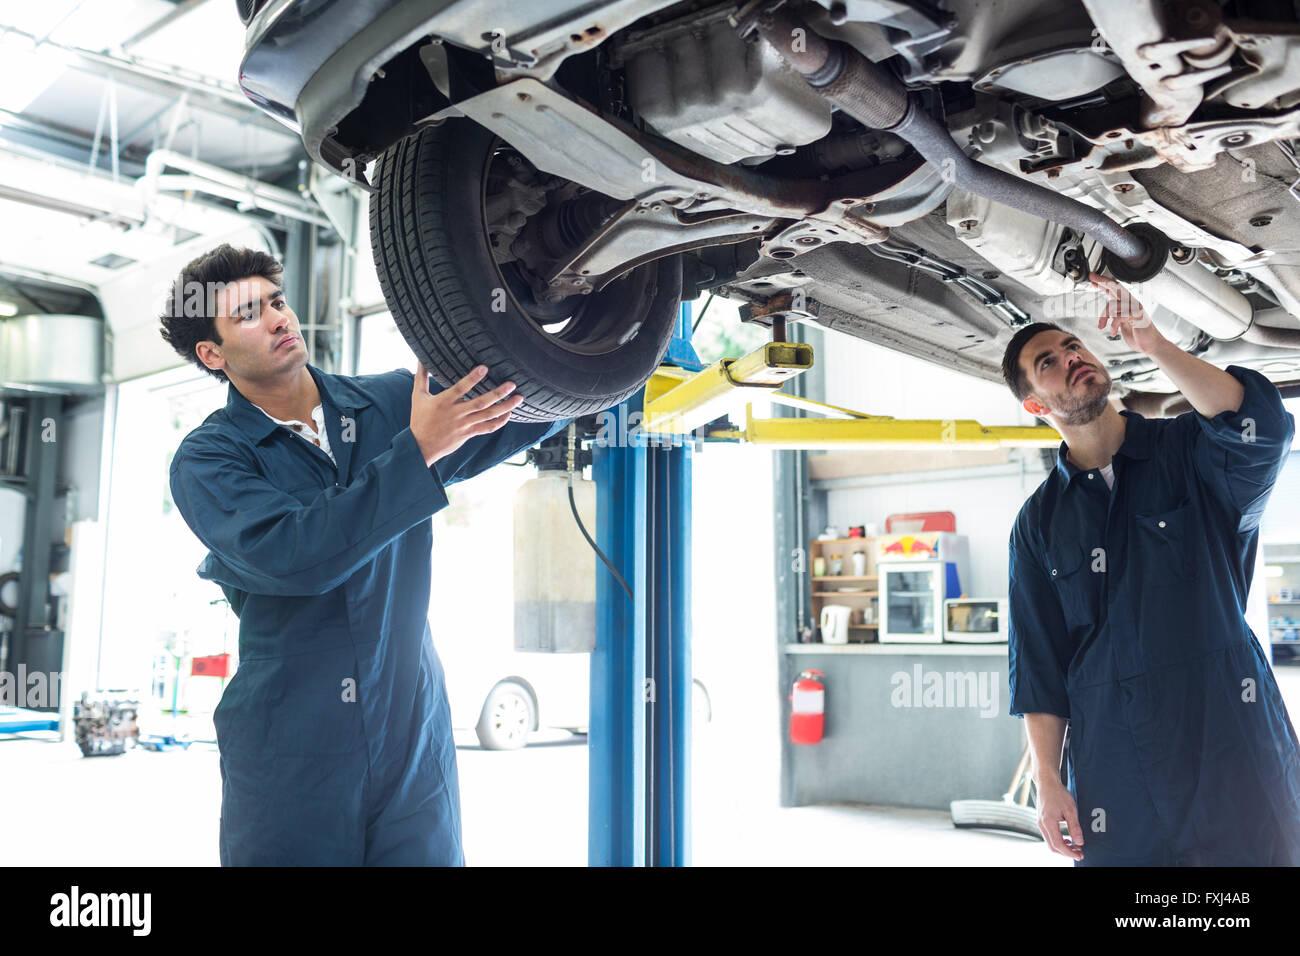 Mechanic fixing a wheel while a colleague examining car - Stock Image